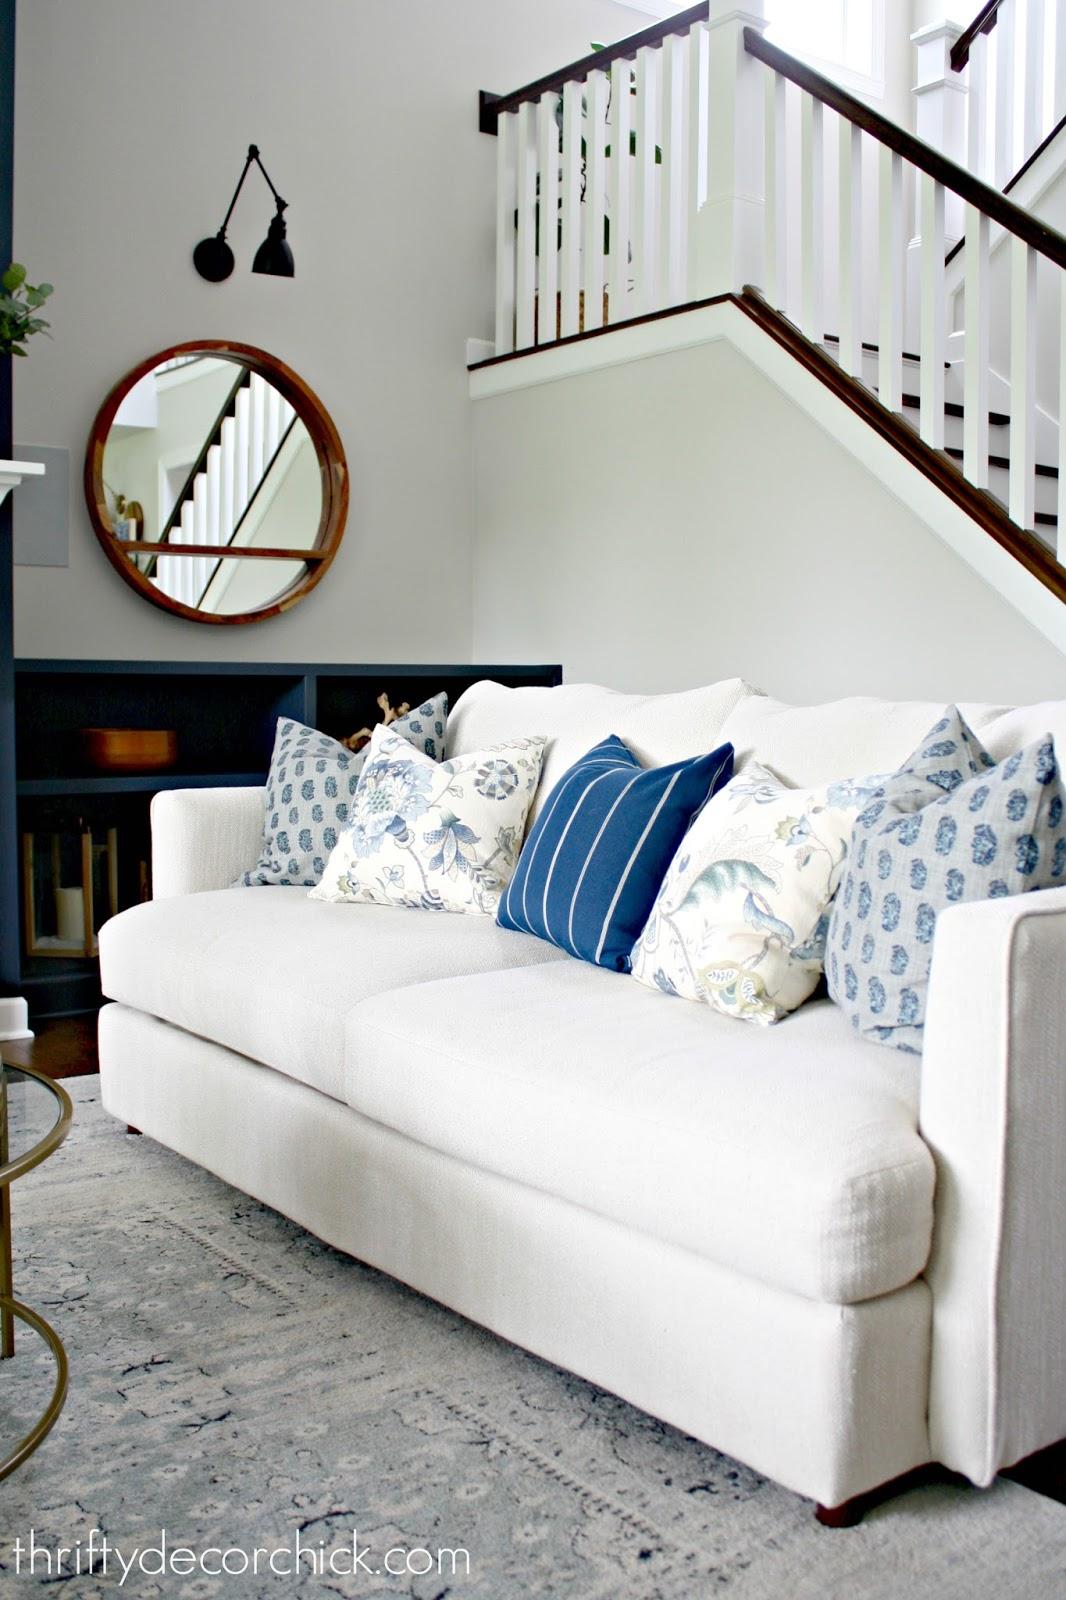 How to mix and match pillow fabrics